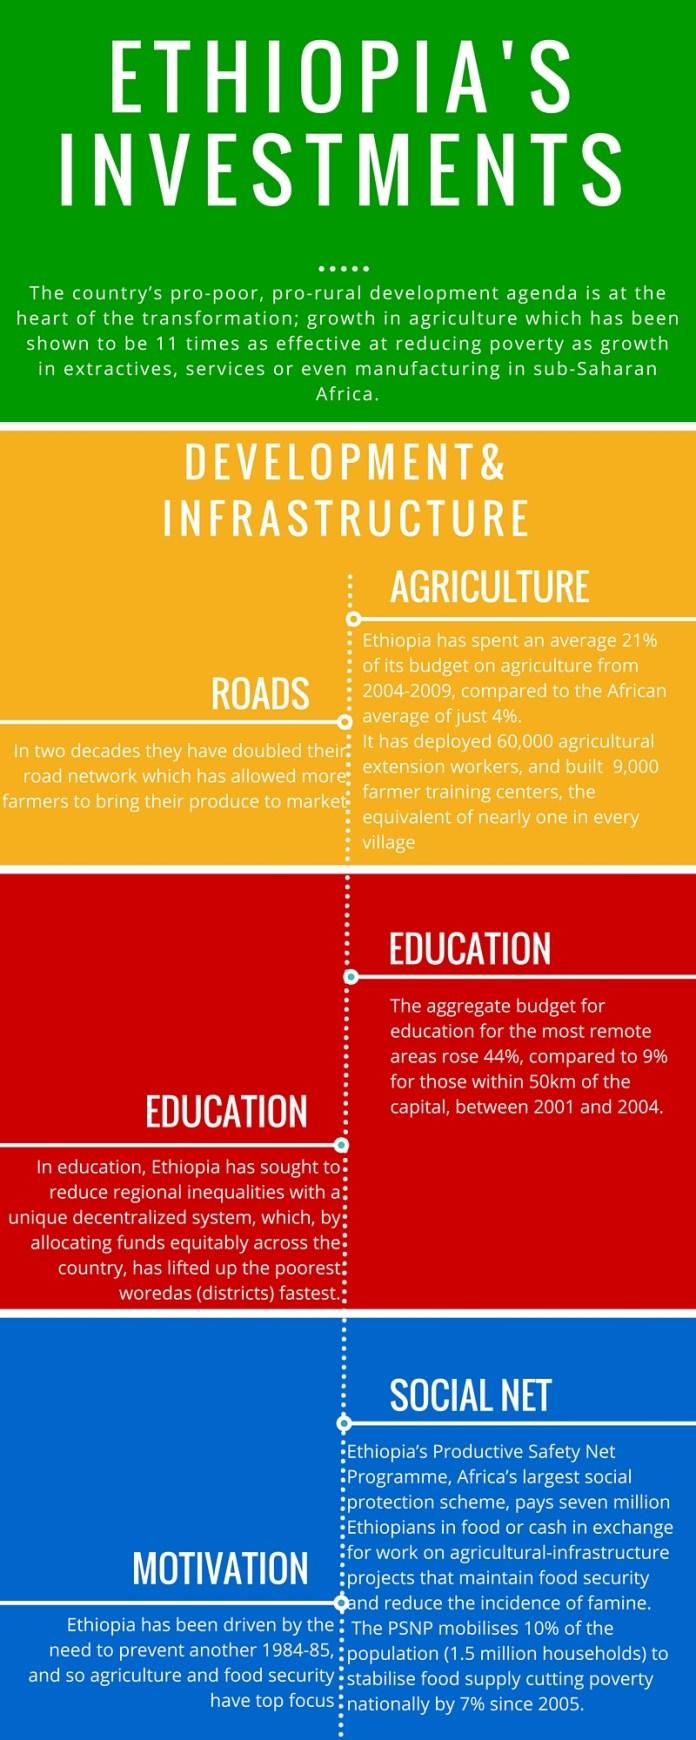 ethiopia's investments infographic